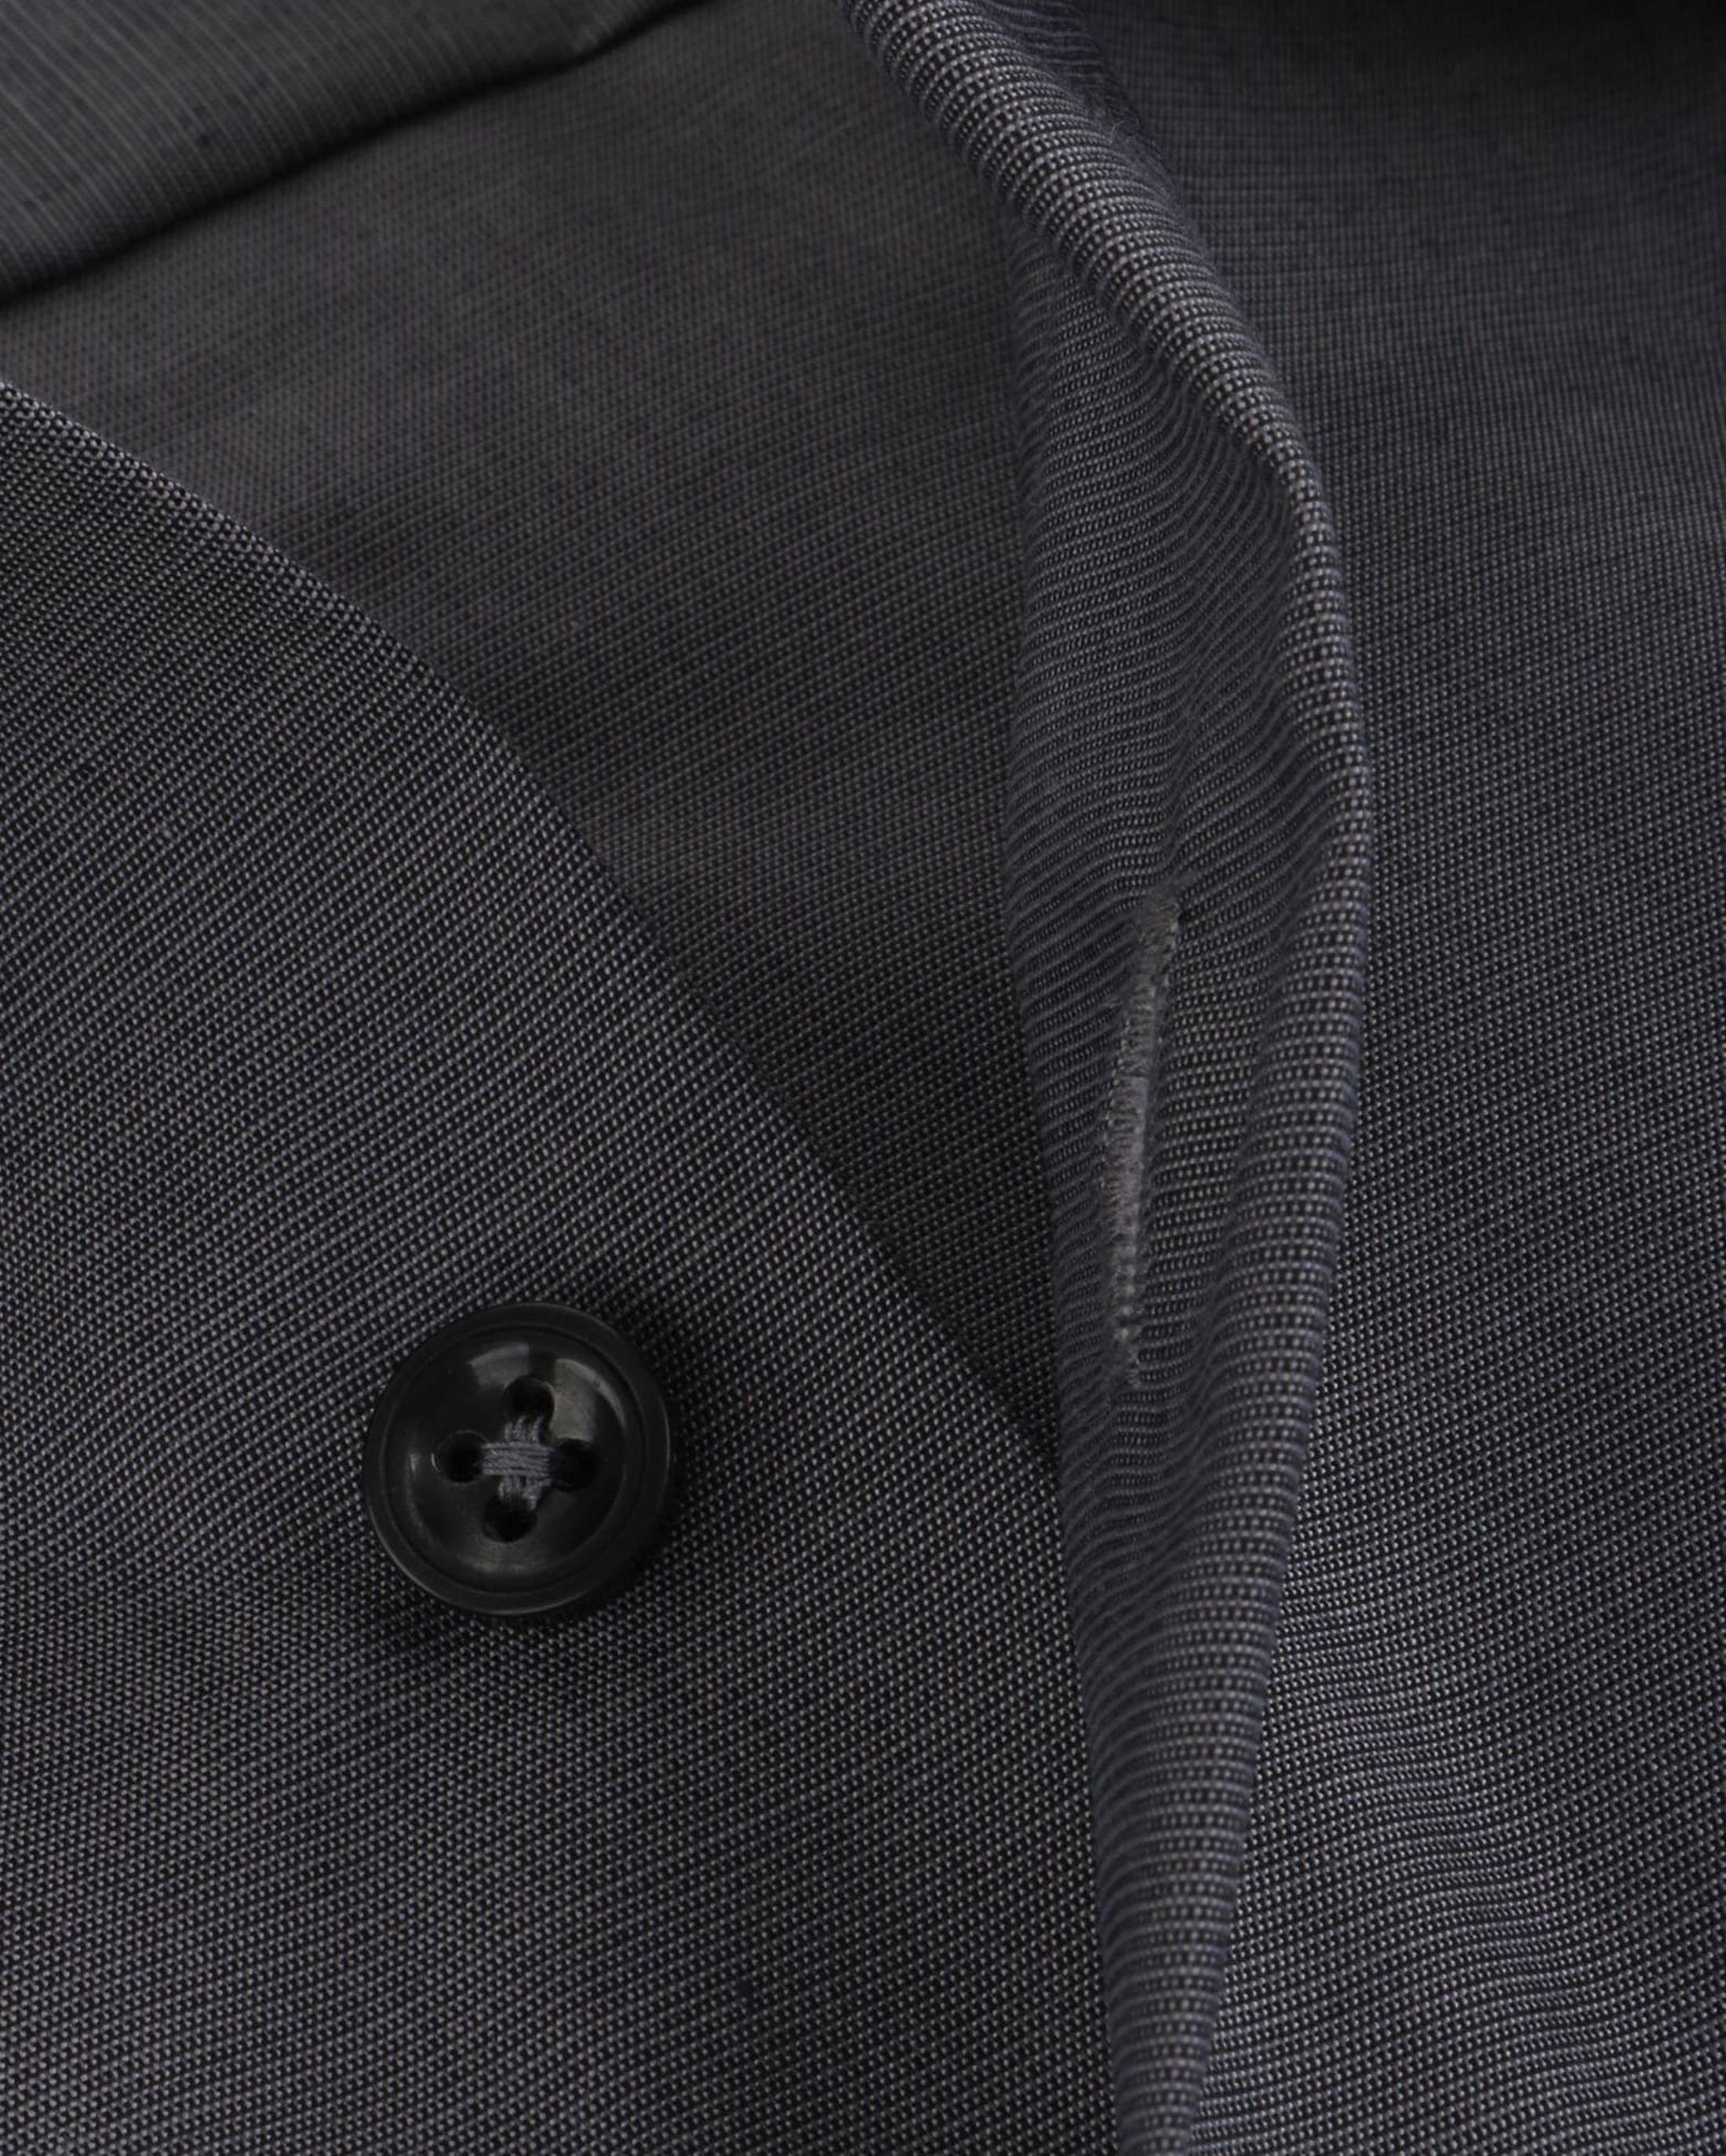 Seidensticker Overhemd Comfort Fit Antraciet foto 1